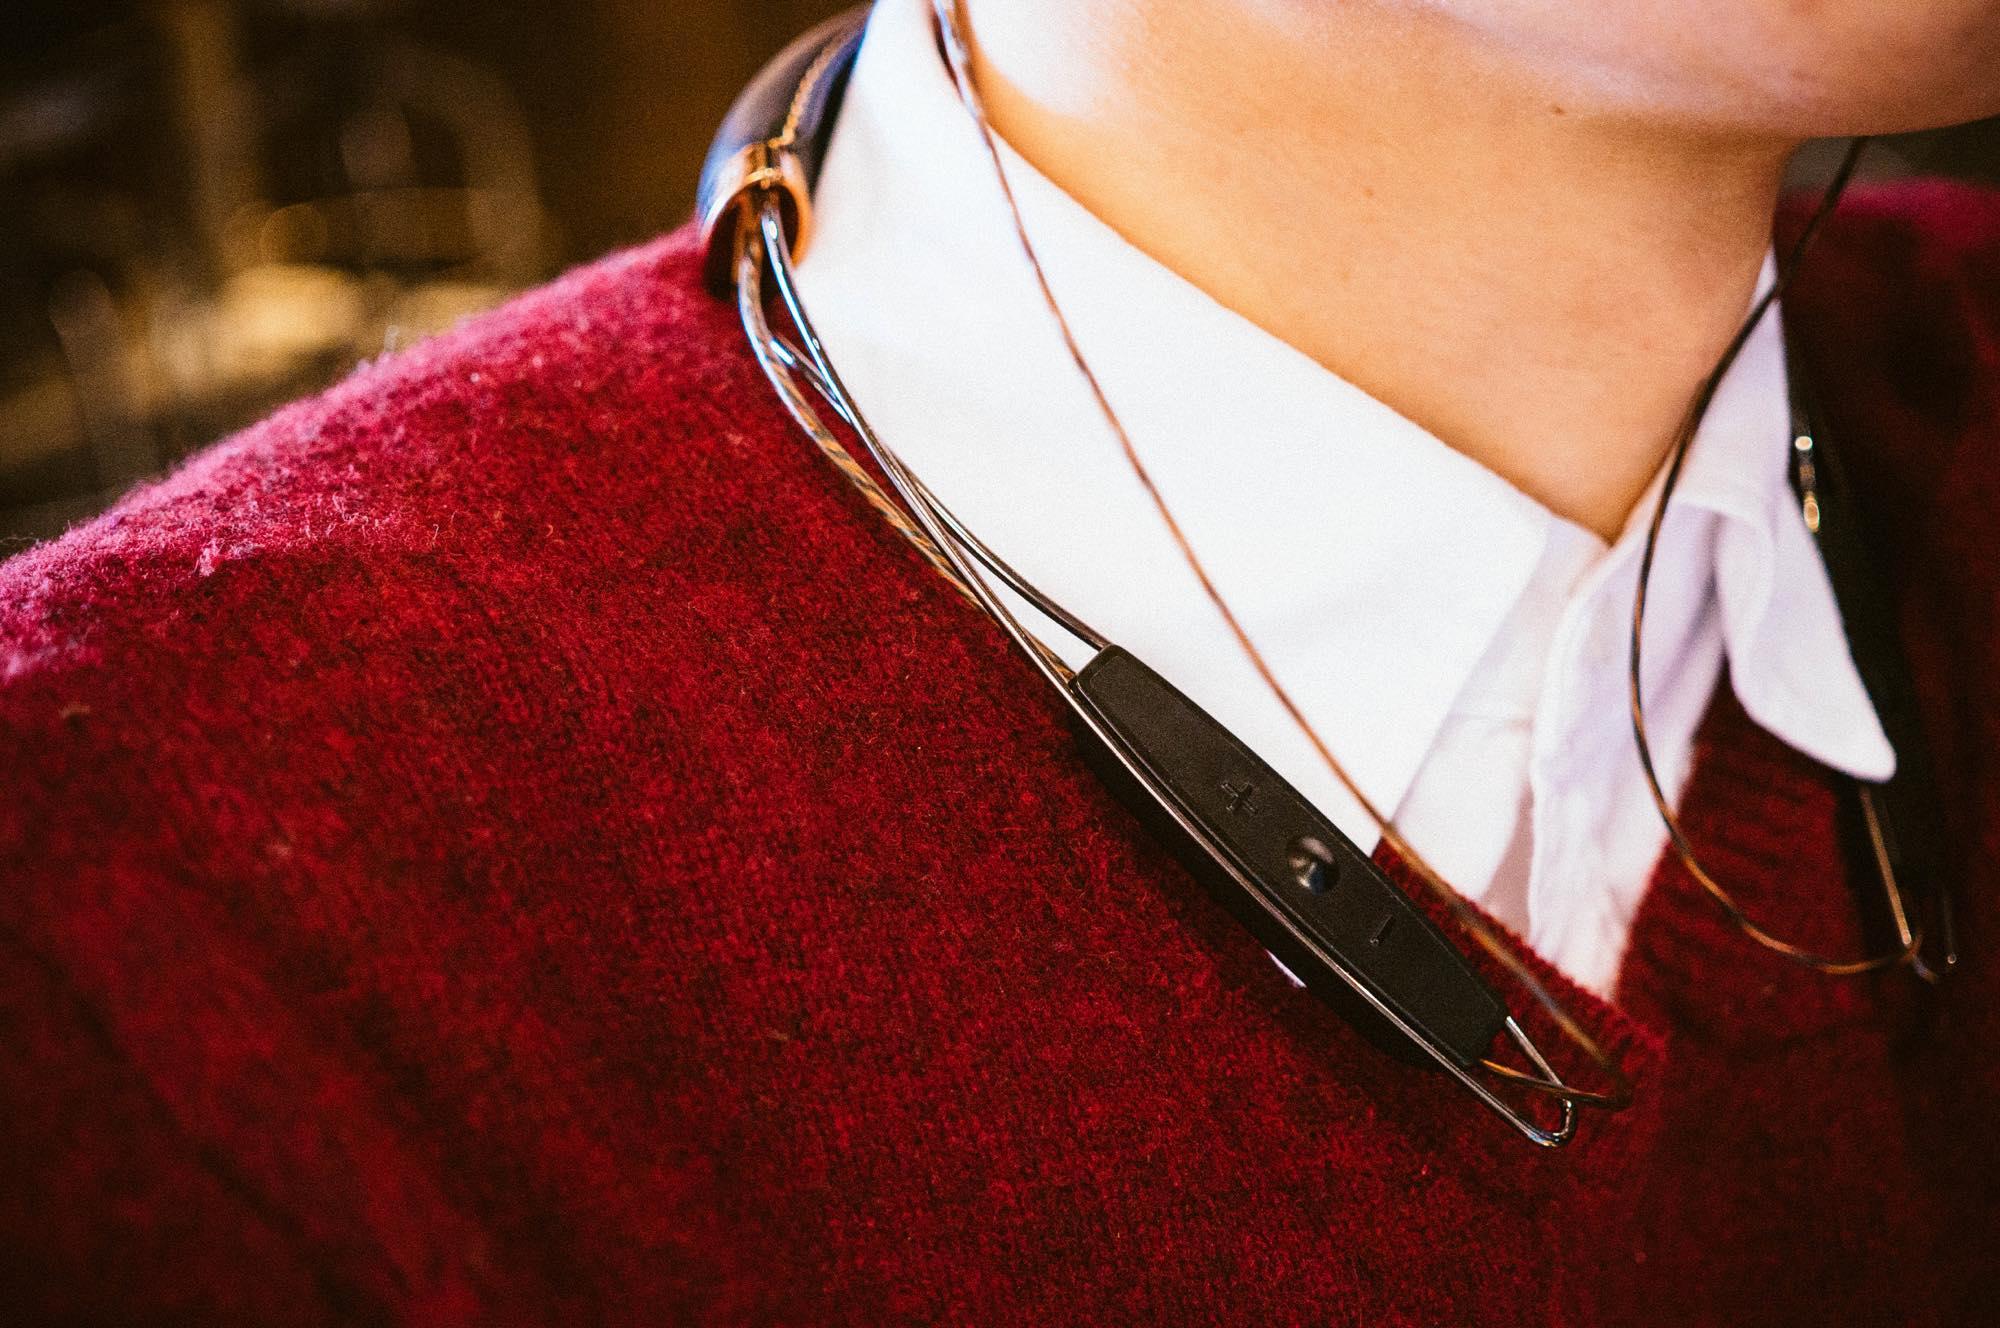 x12-neckband19